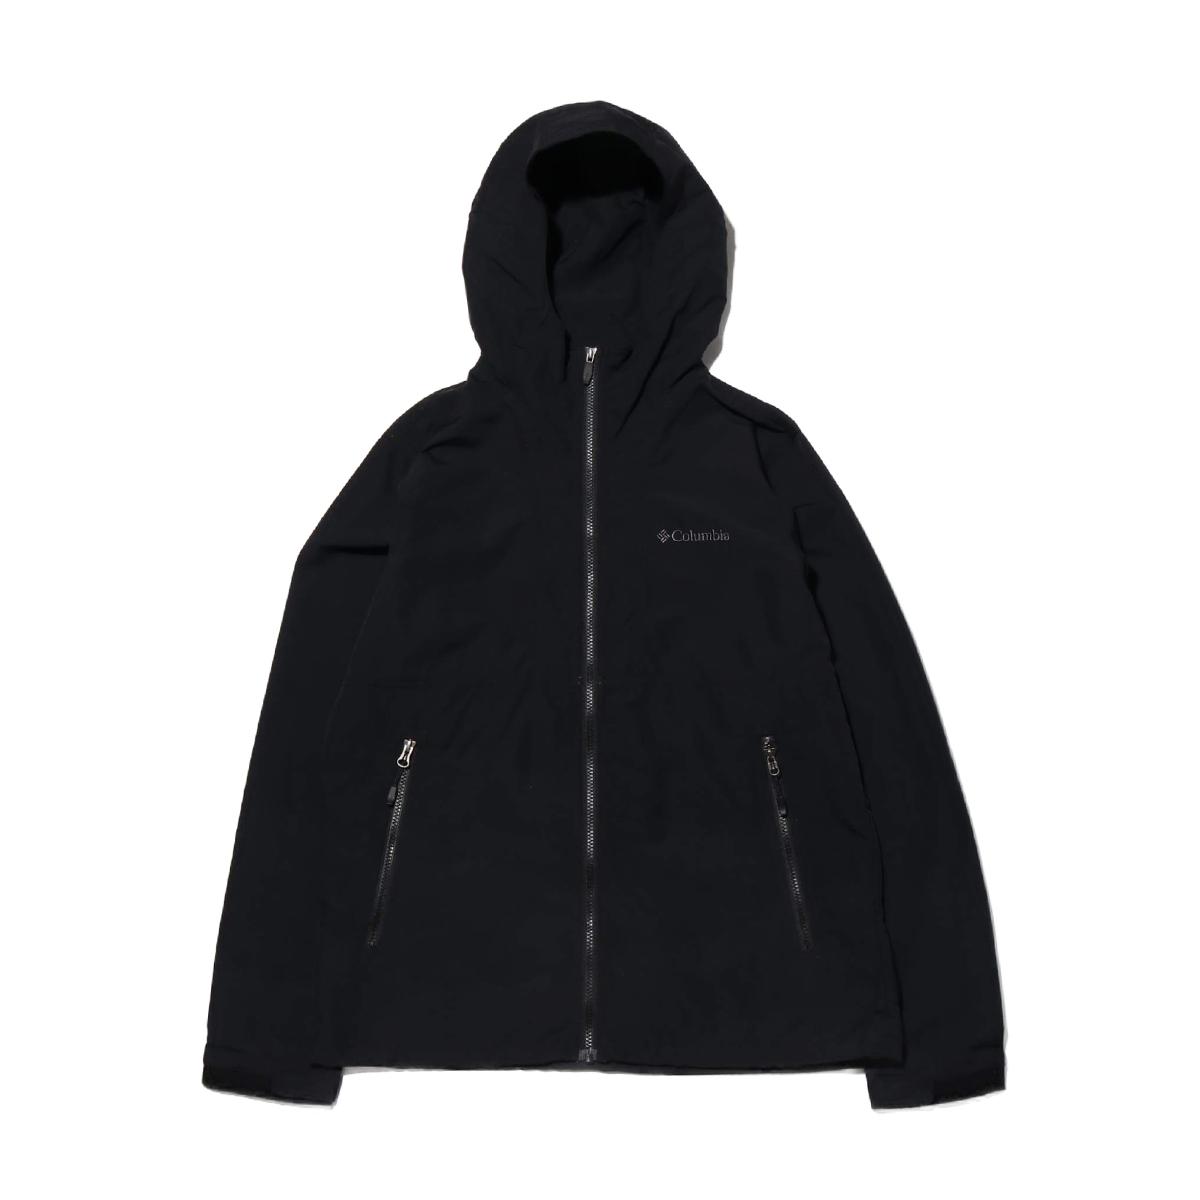 Columbia Hazen™ Jacket(Black)(コロンビア ヘイゼン™ ジャケット)【メンズ】【ジャケット】【20SS-I】